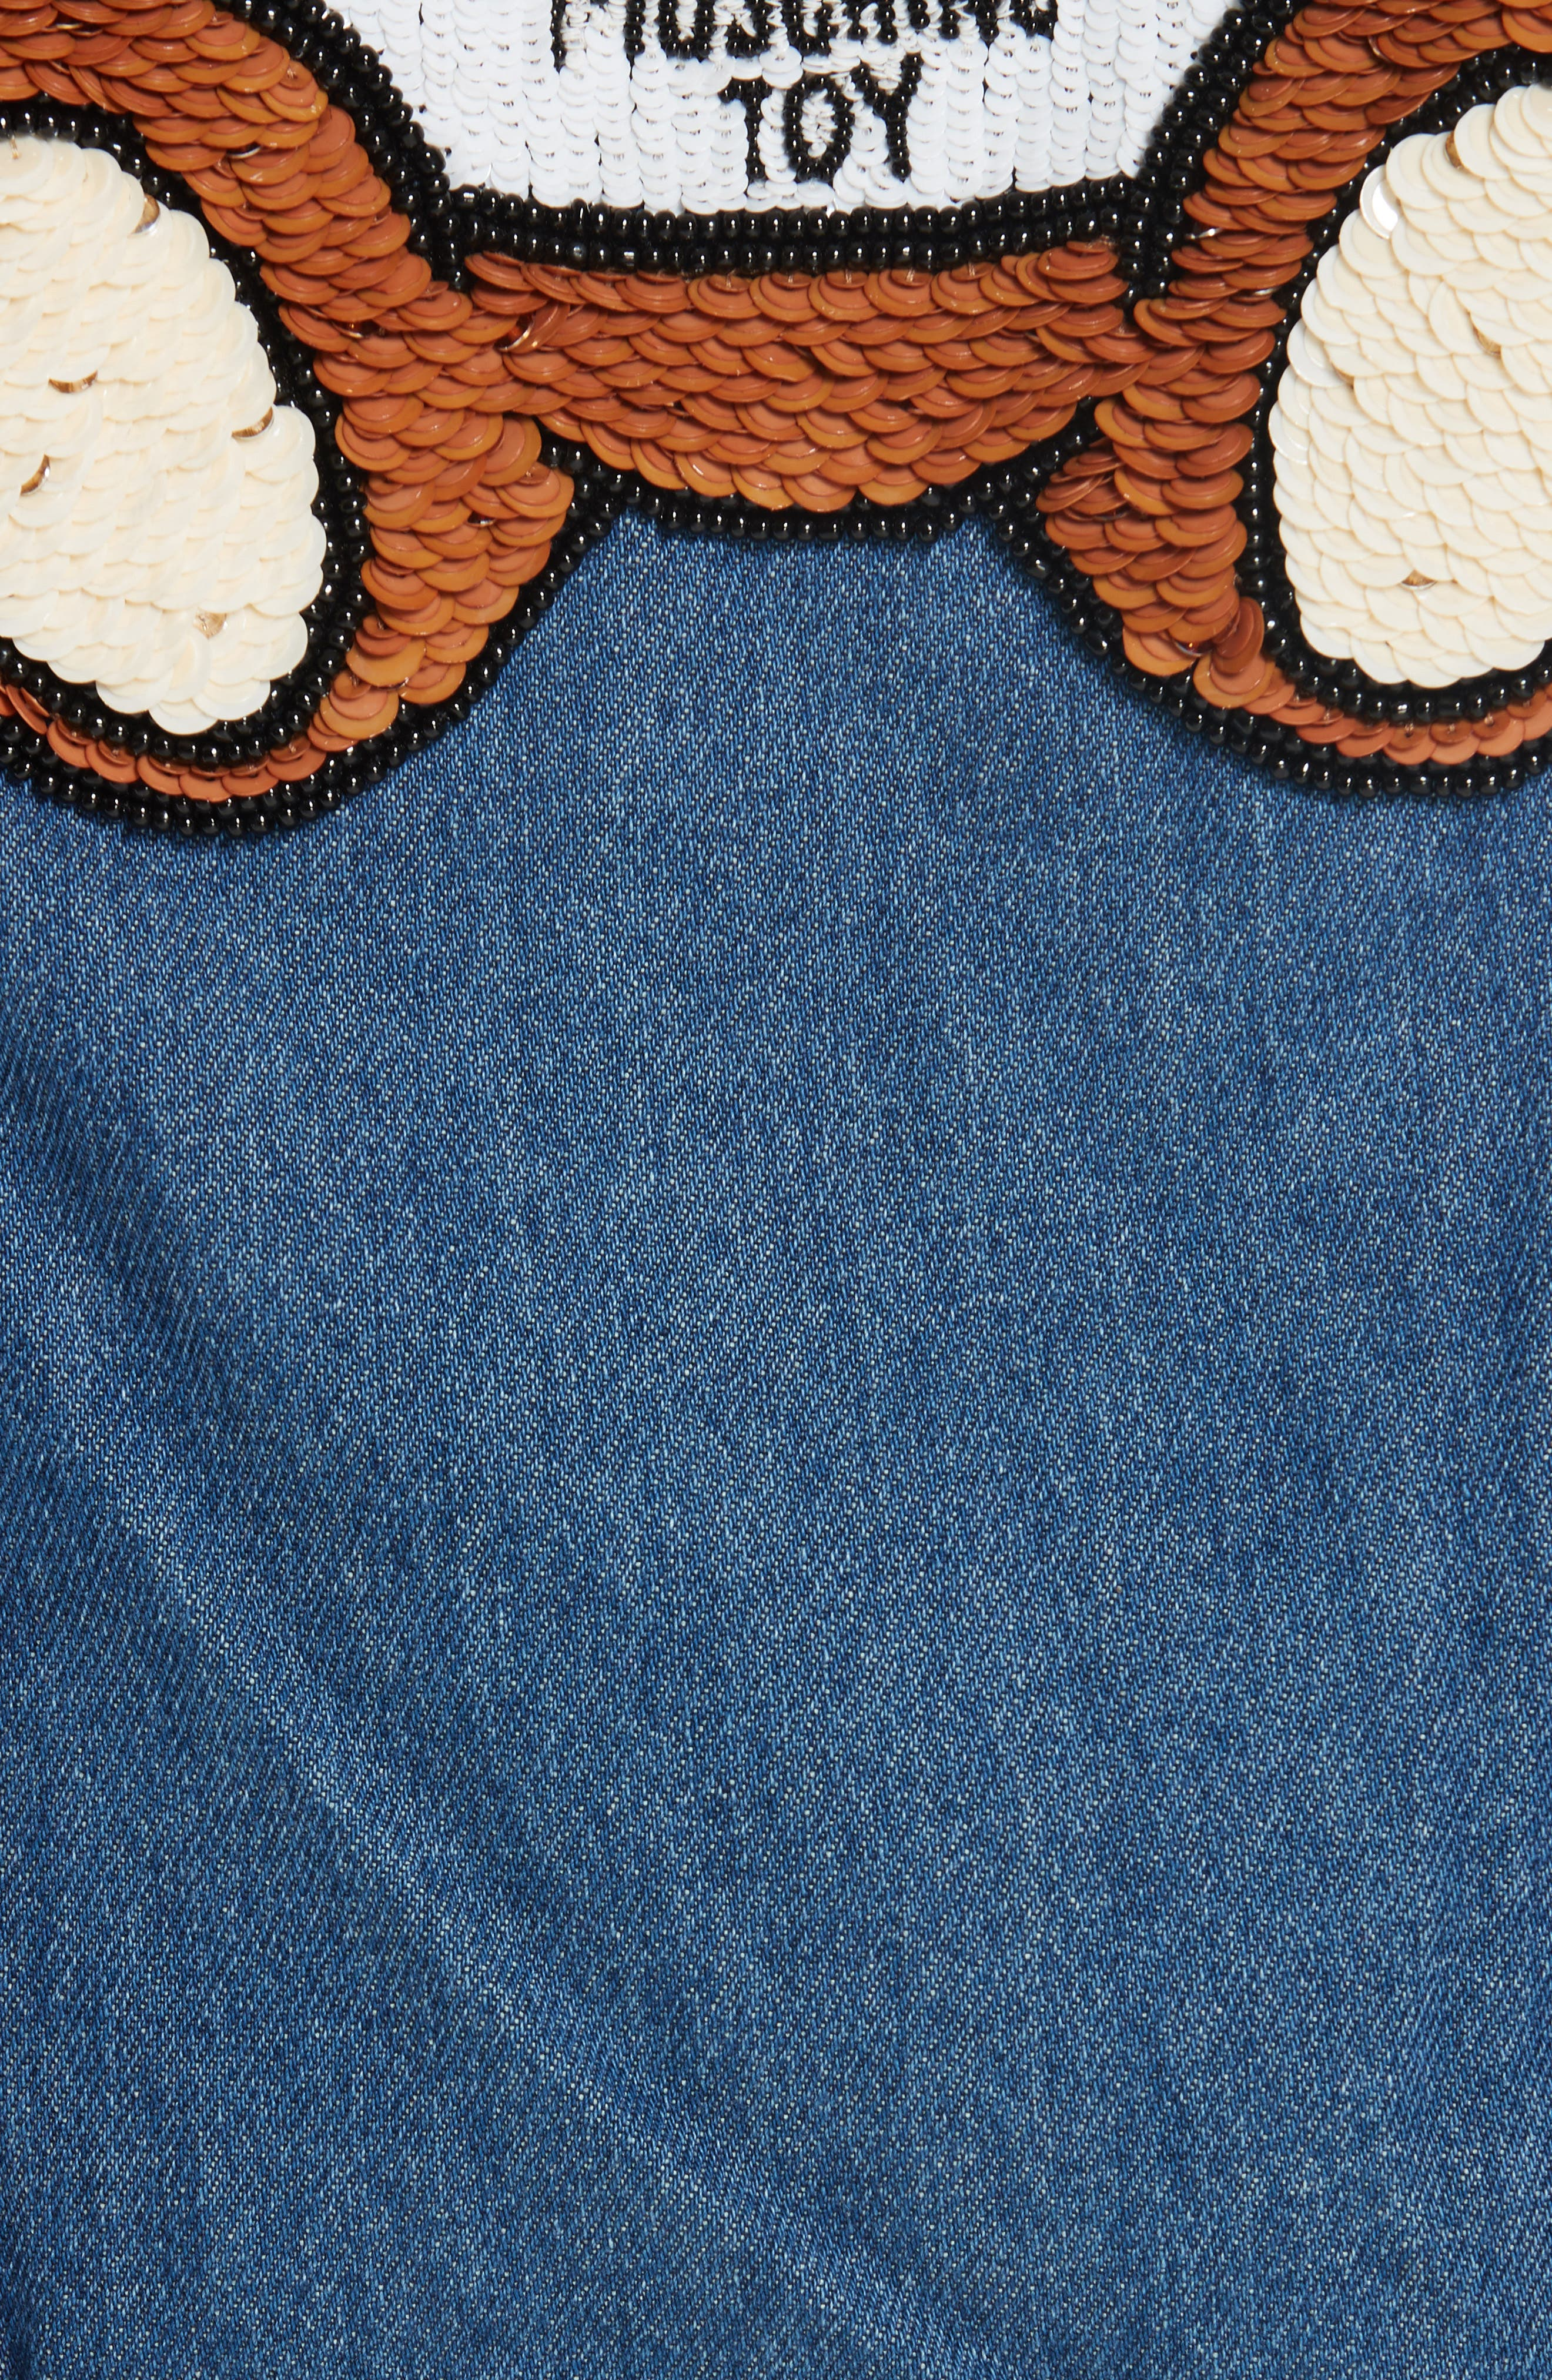 MOSCHINO, Sequin Teddy Denim Jacket, Alternate thumbnail 7, color, DENIM